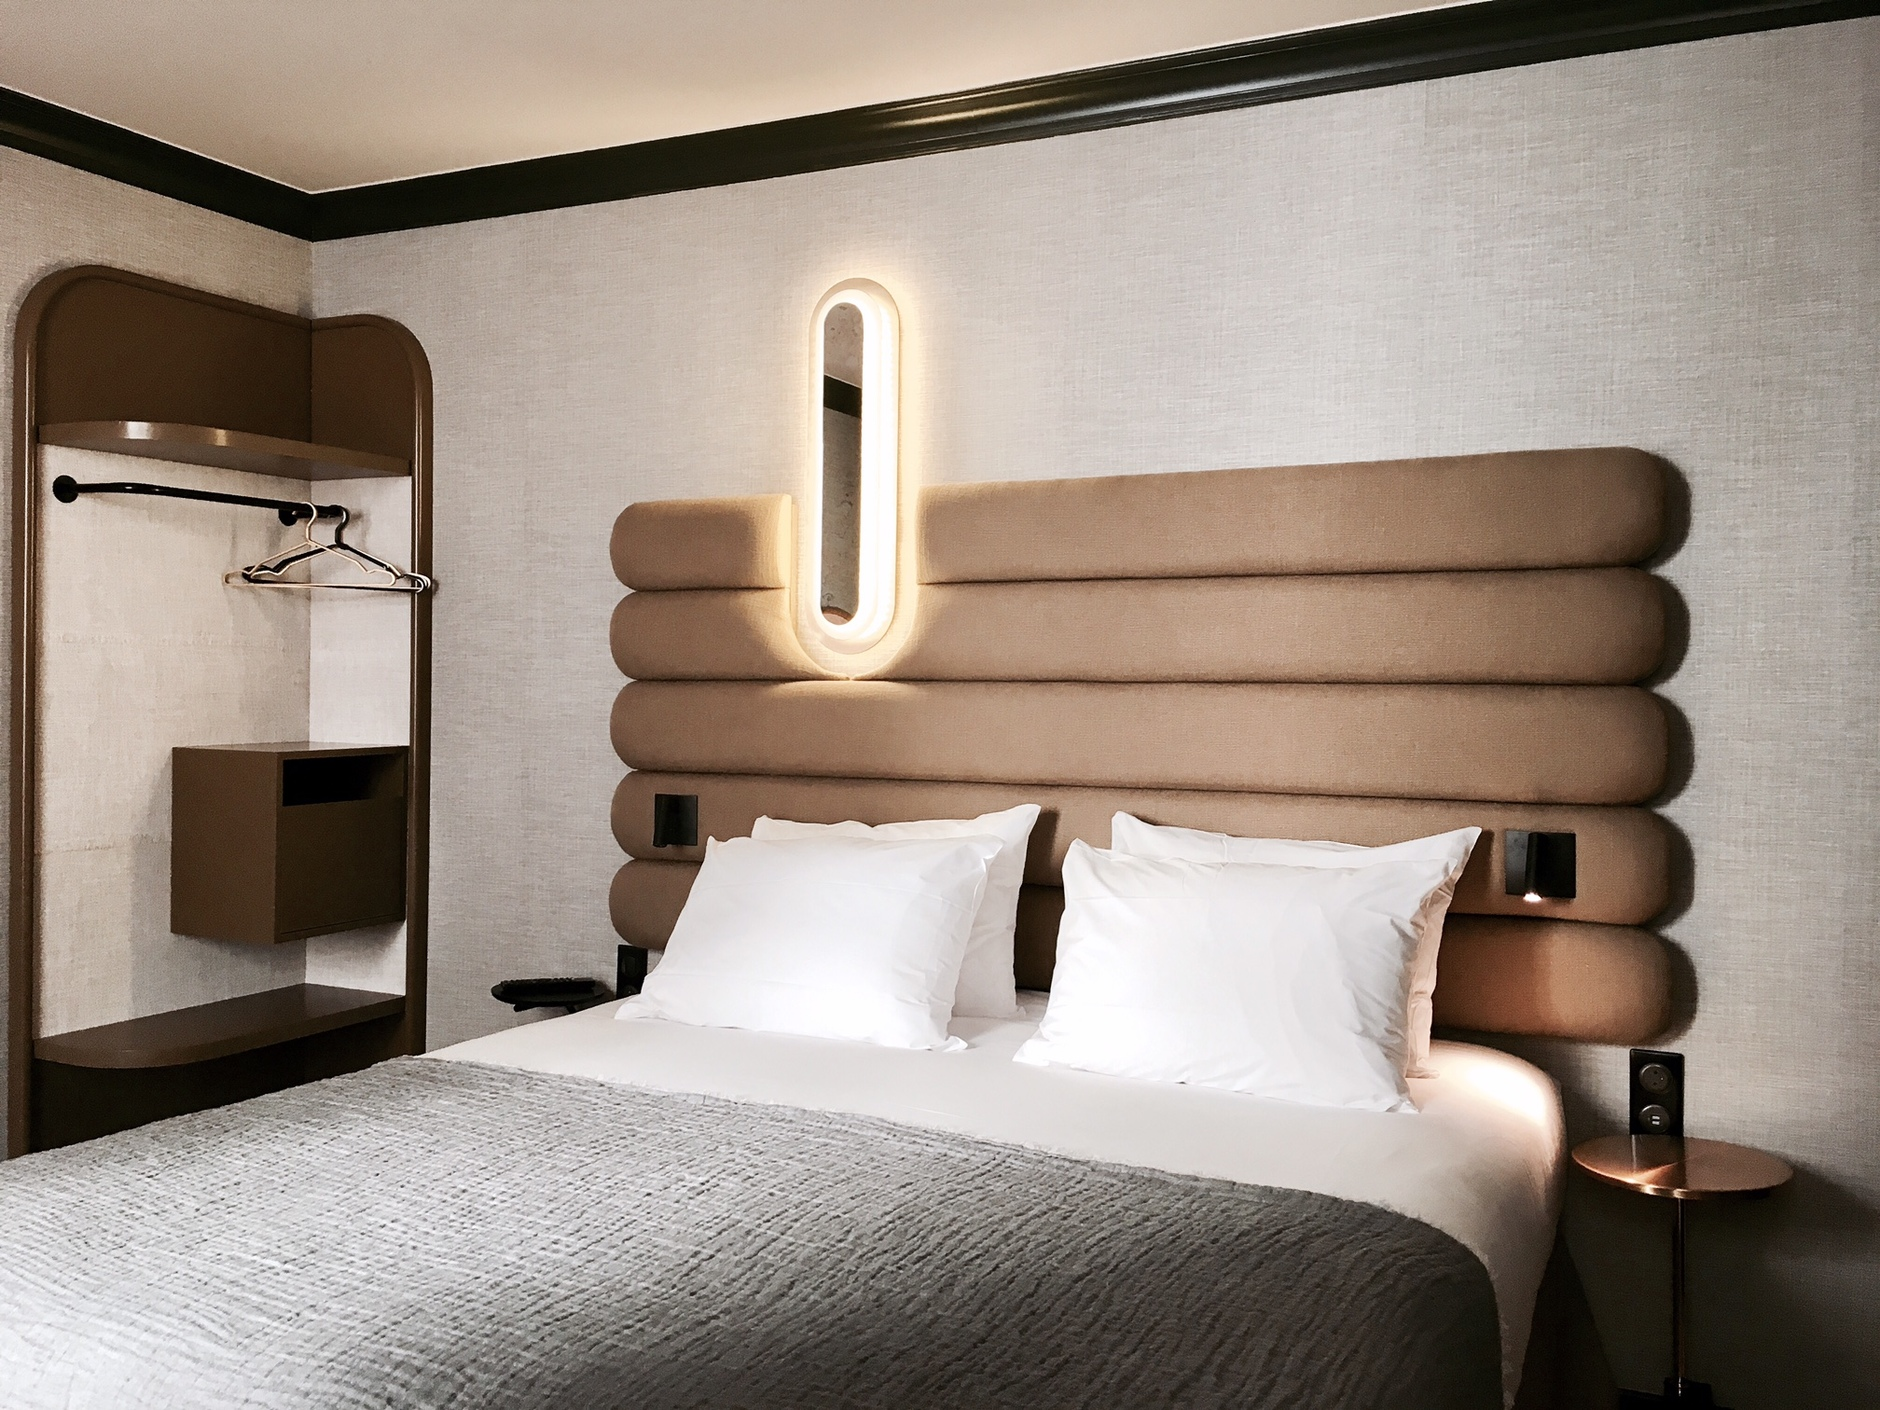 Отель в Париже в стиле ар-деко (галерея 11, фото 5)